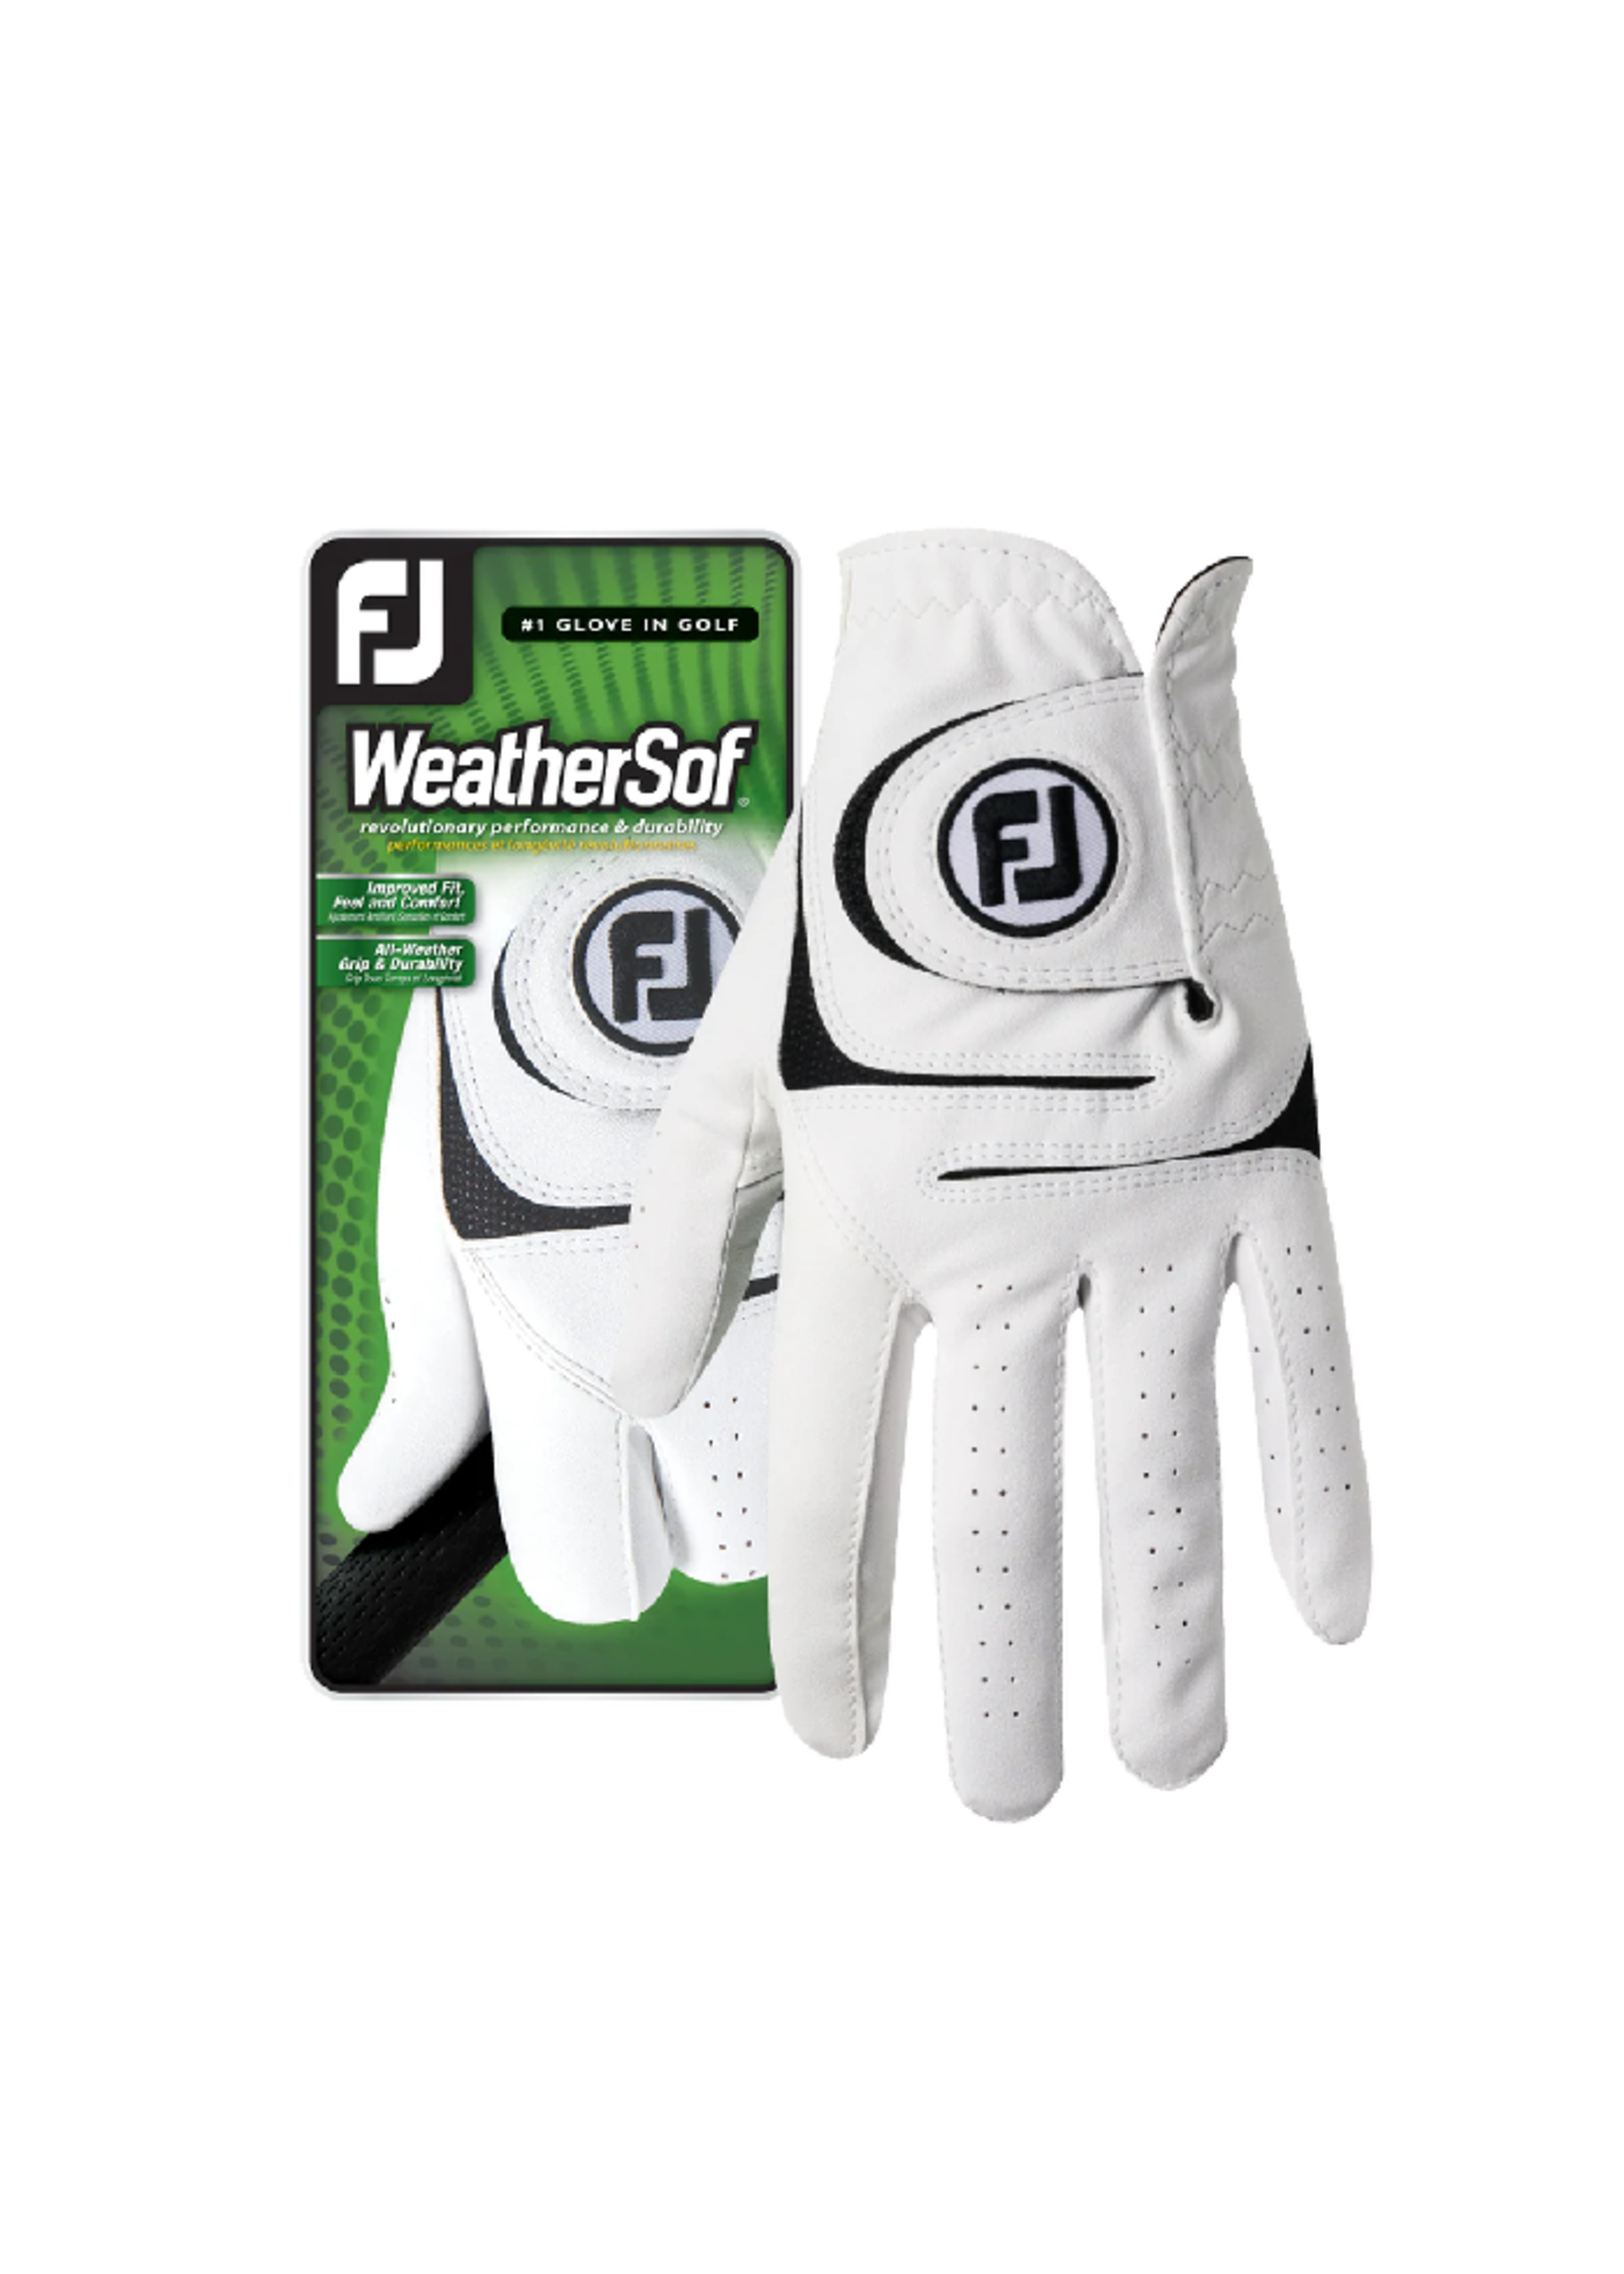 FJ WeatherSof Cadet Glove Regular Men